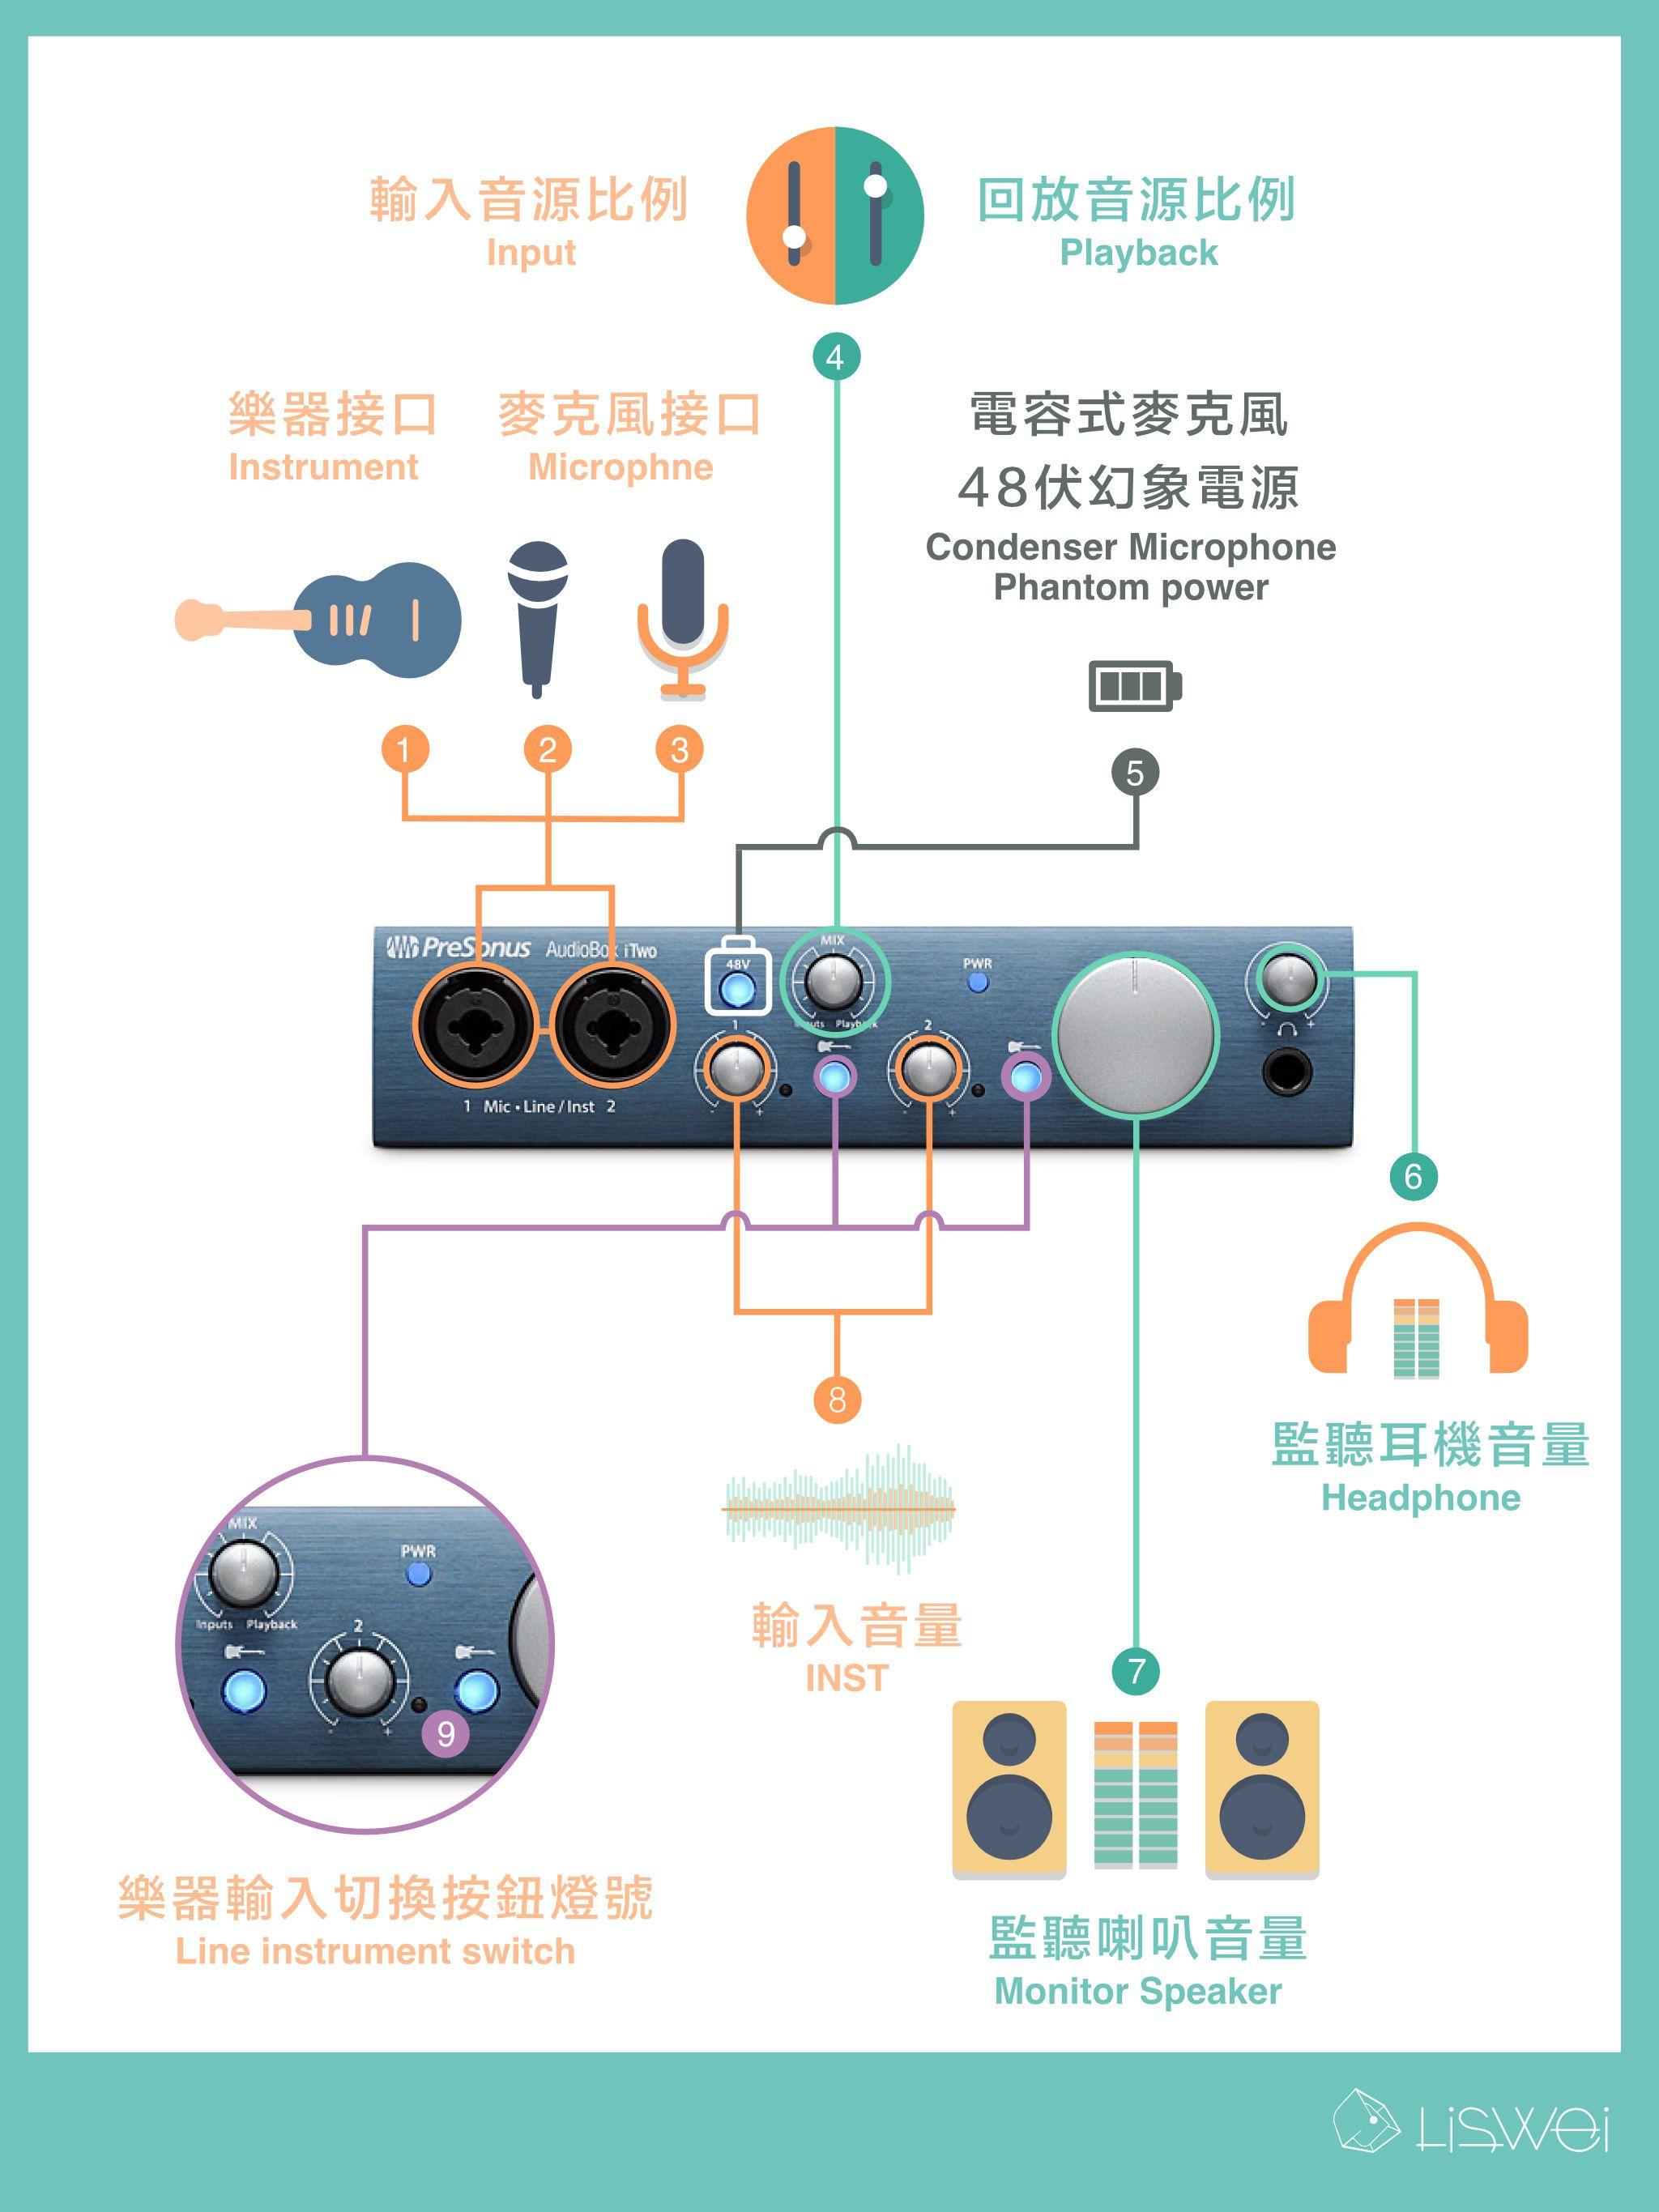 audiobox-itwo-1-compressor-2